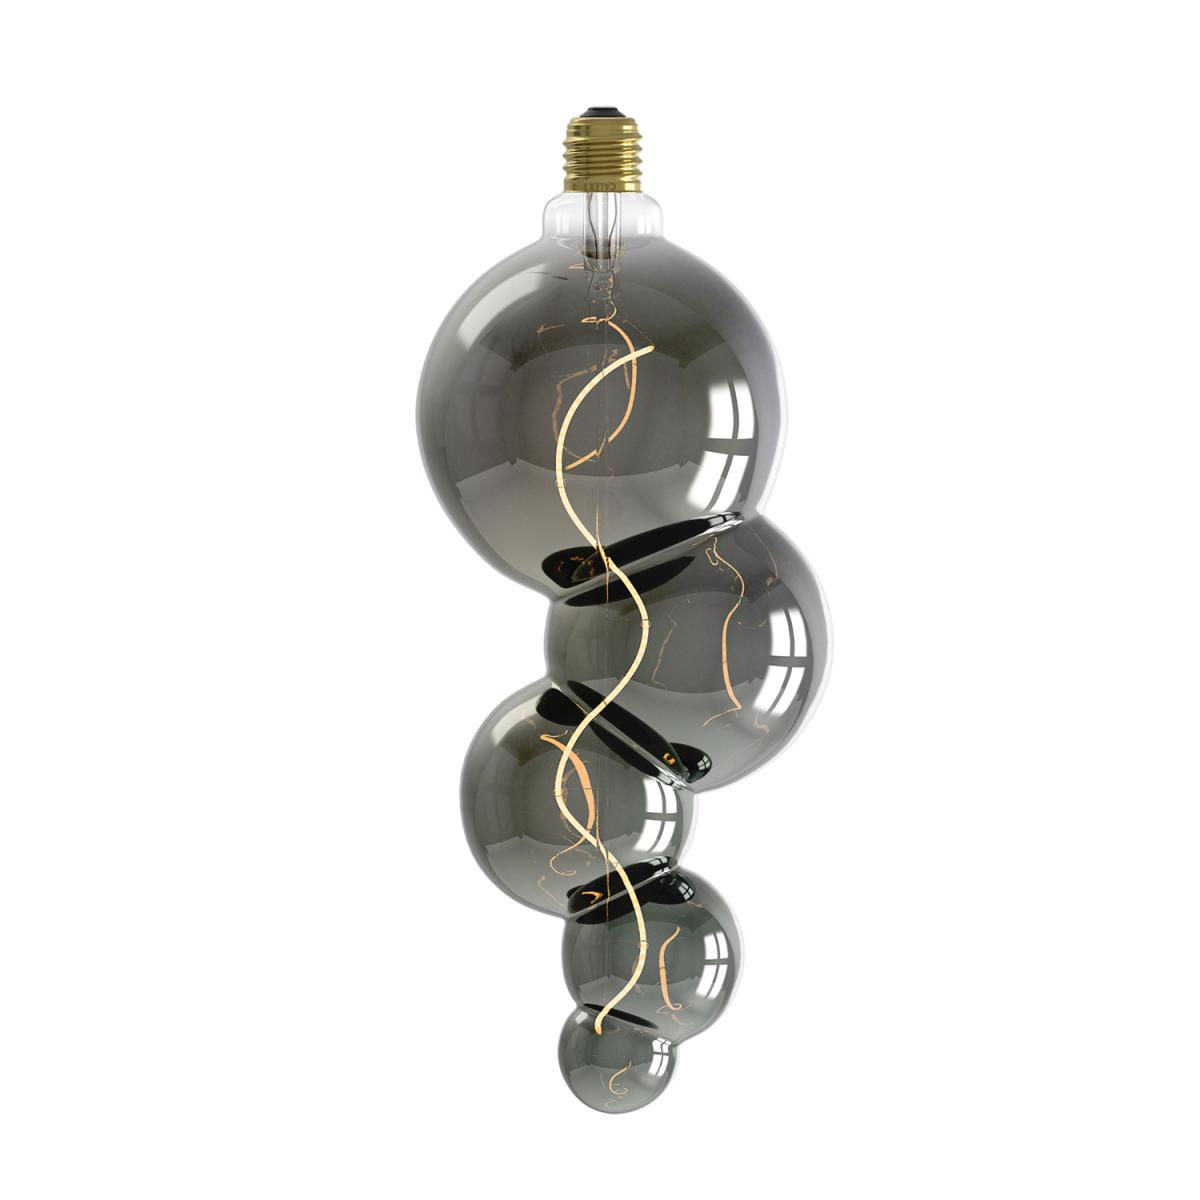 XXL Design LED Glühbirne Valencia - Stilvolle und dimmbare Lampe